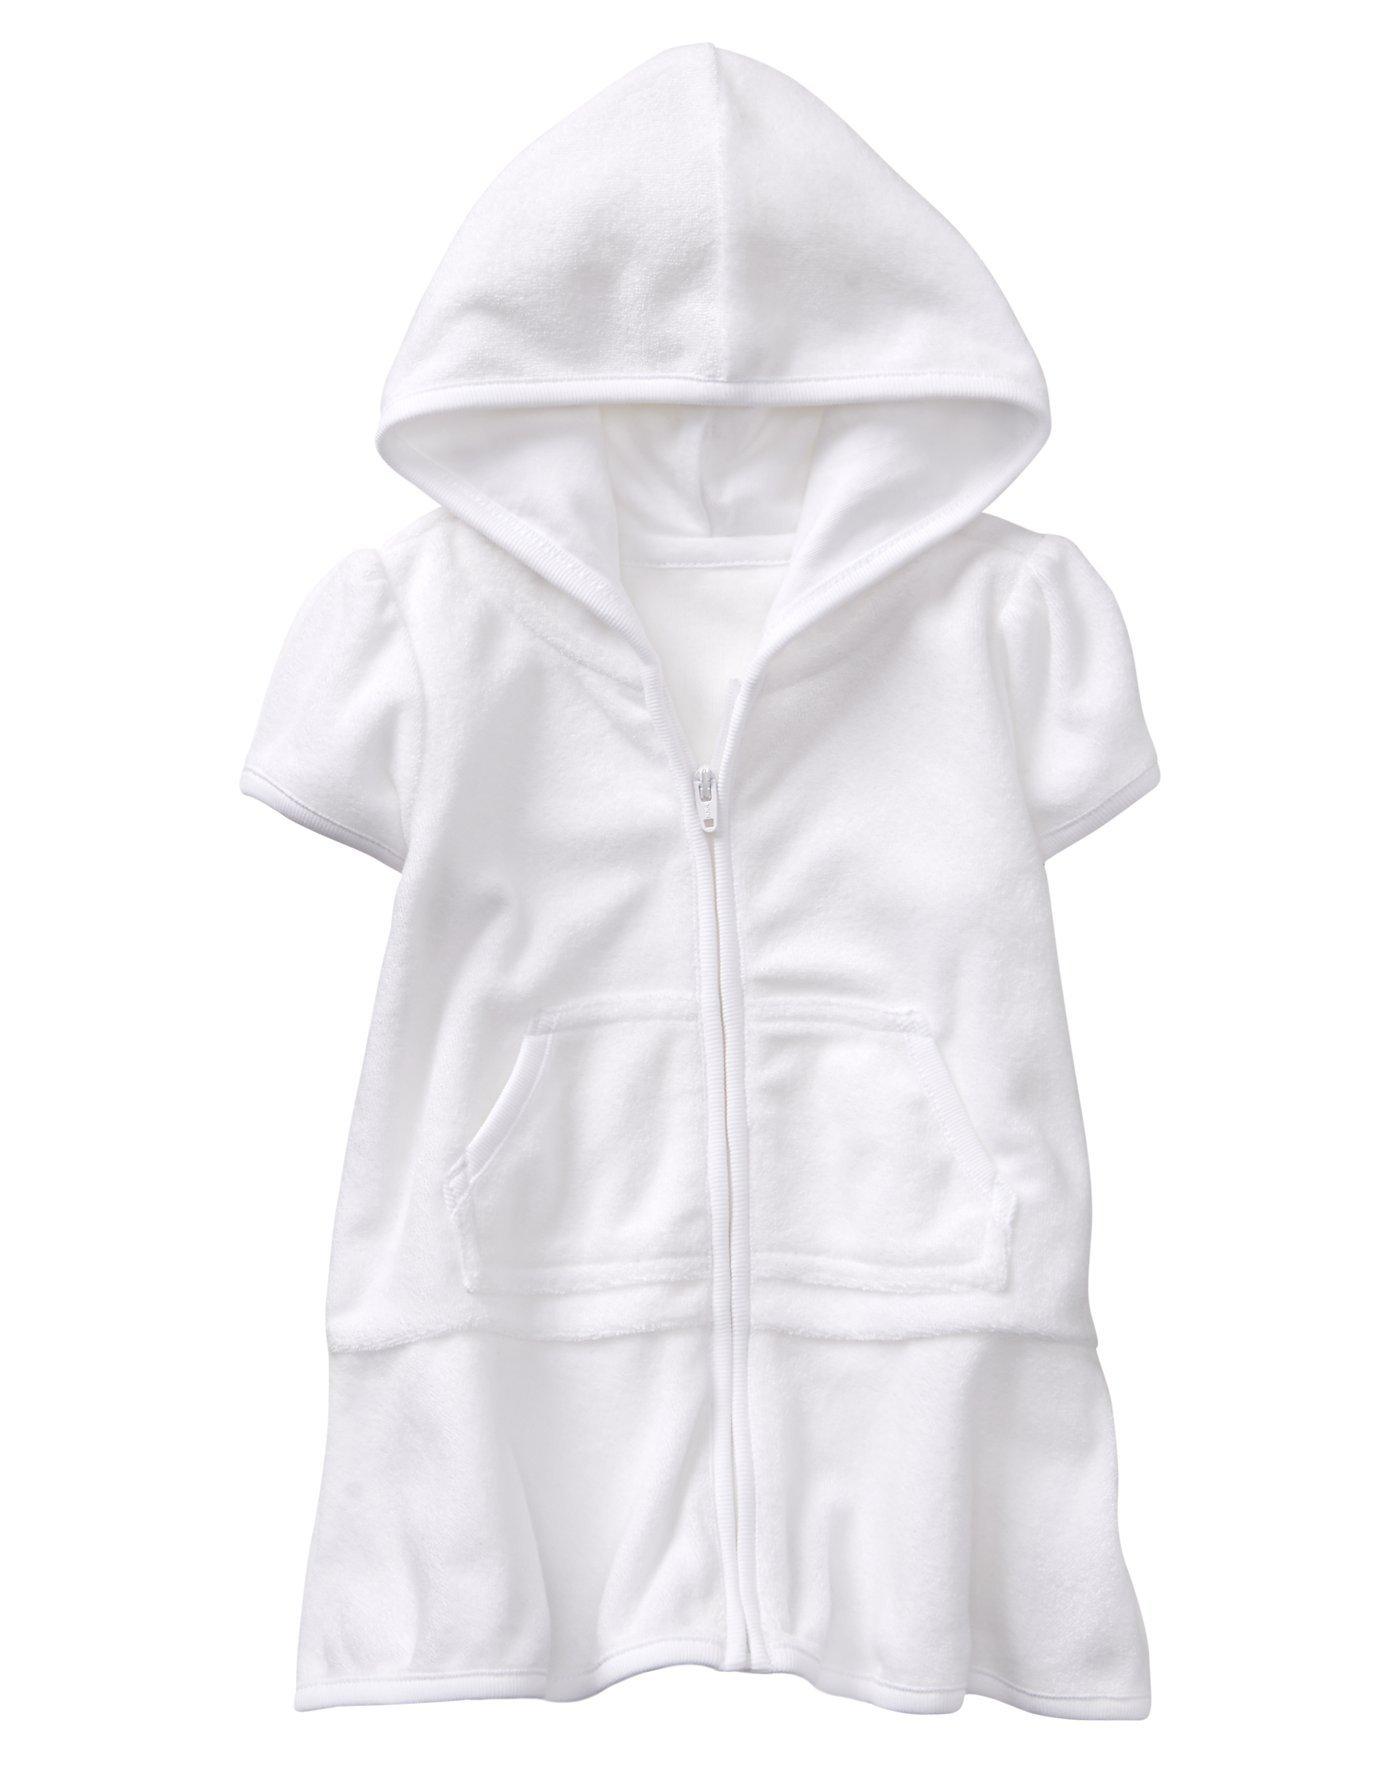 Gymboree Girls' Toddler Hooded Swim Cover Up with Kangaroo Pocket, White, 18-24 mo